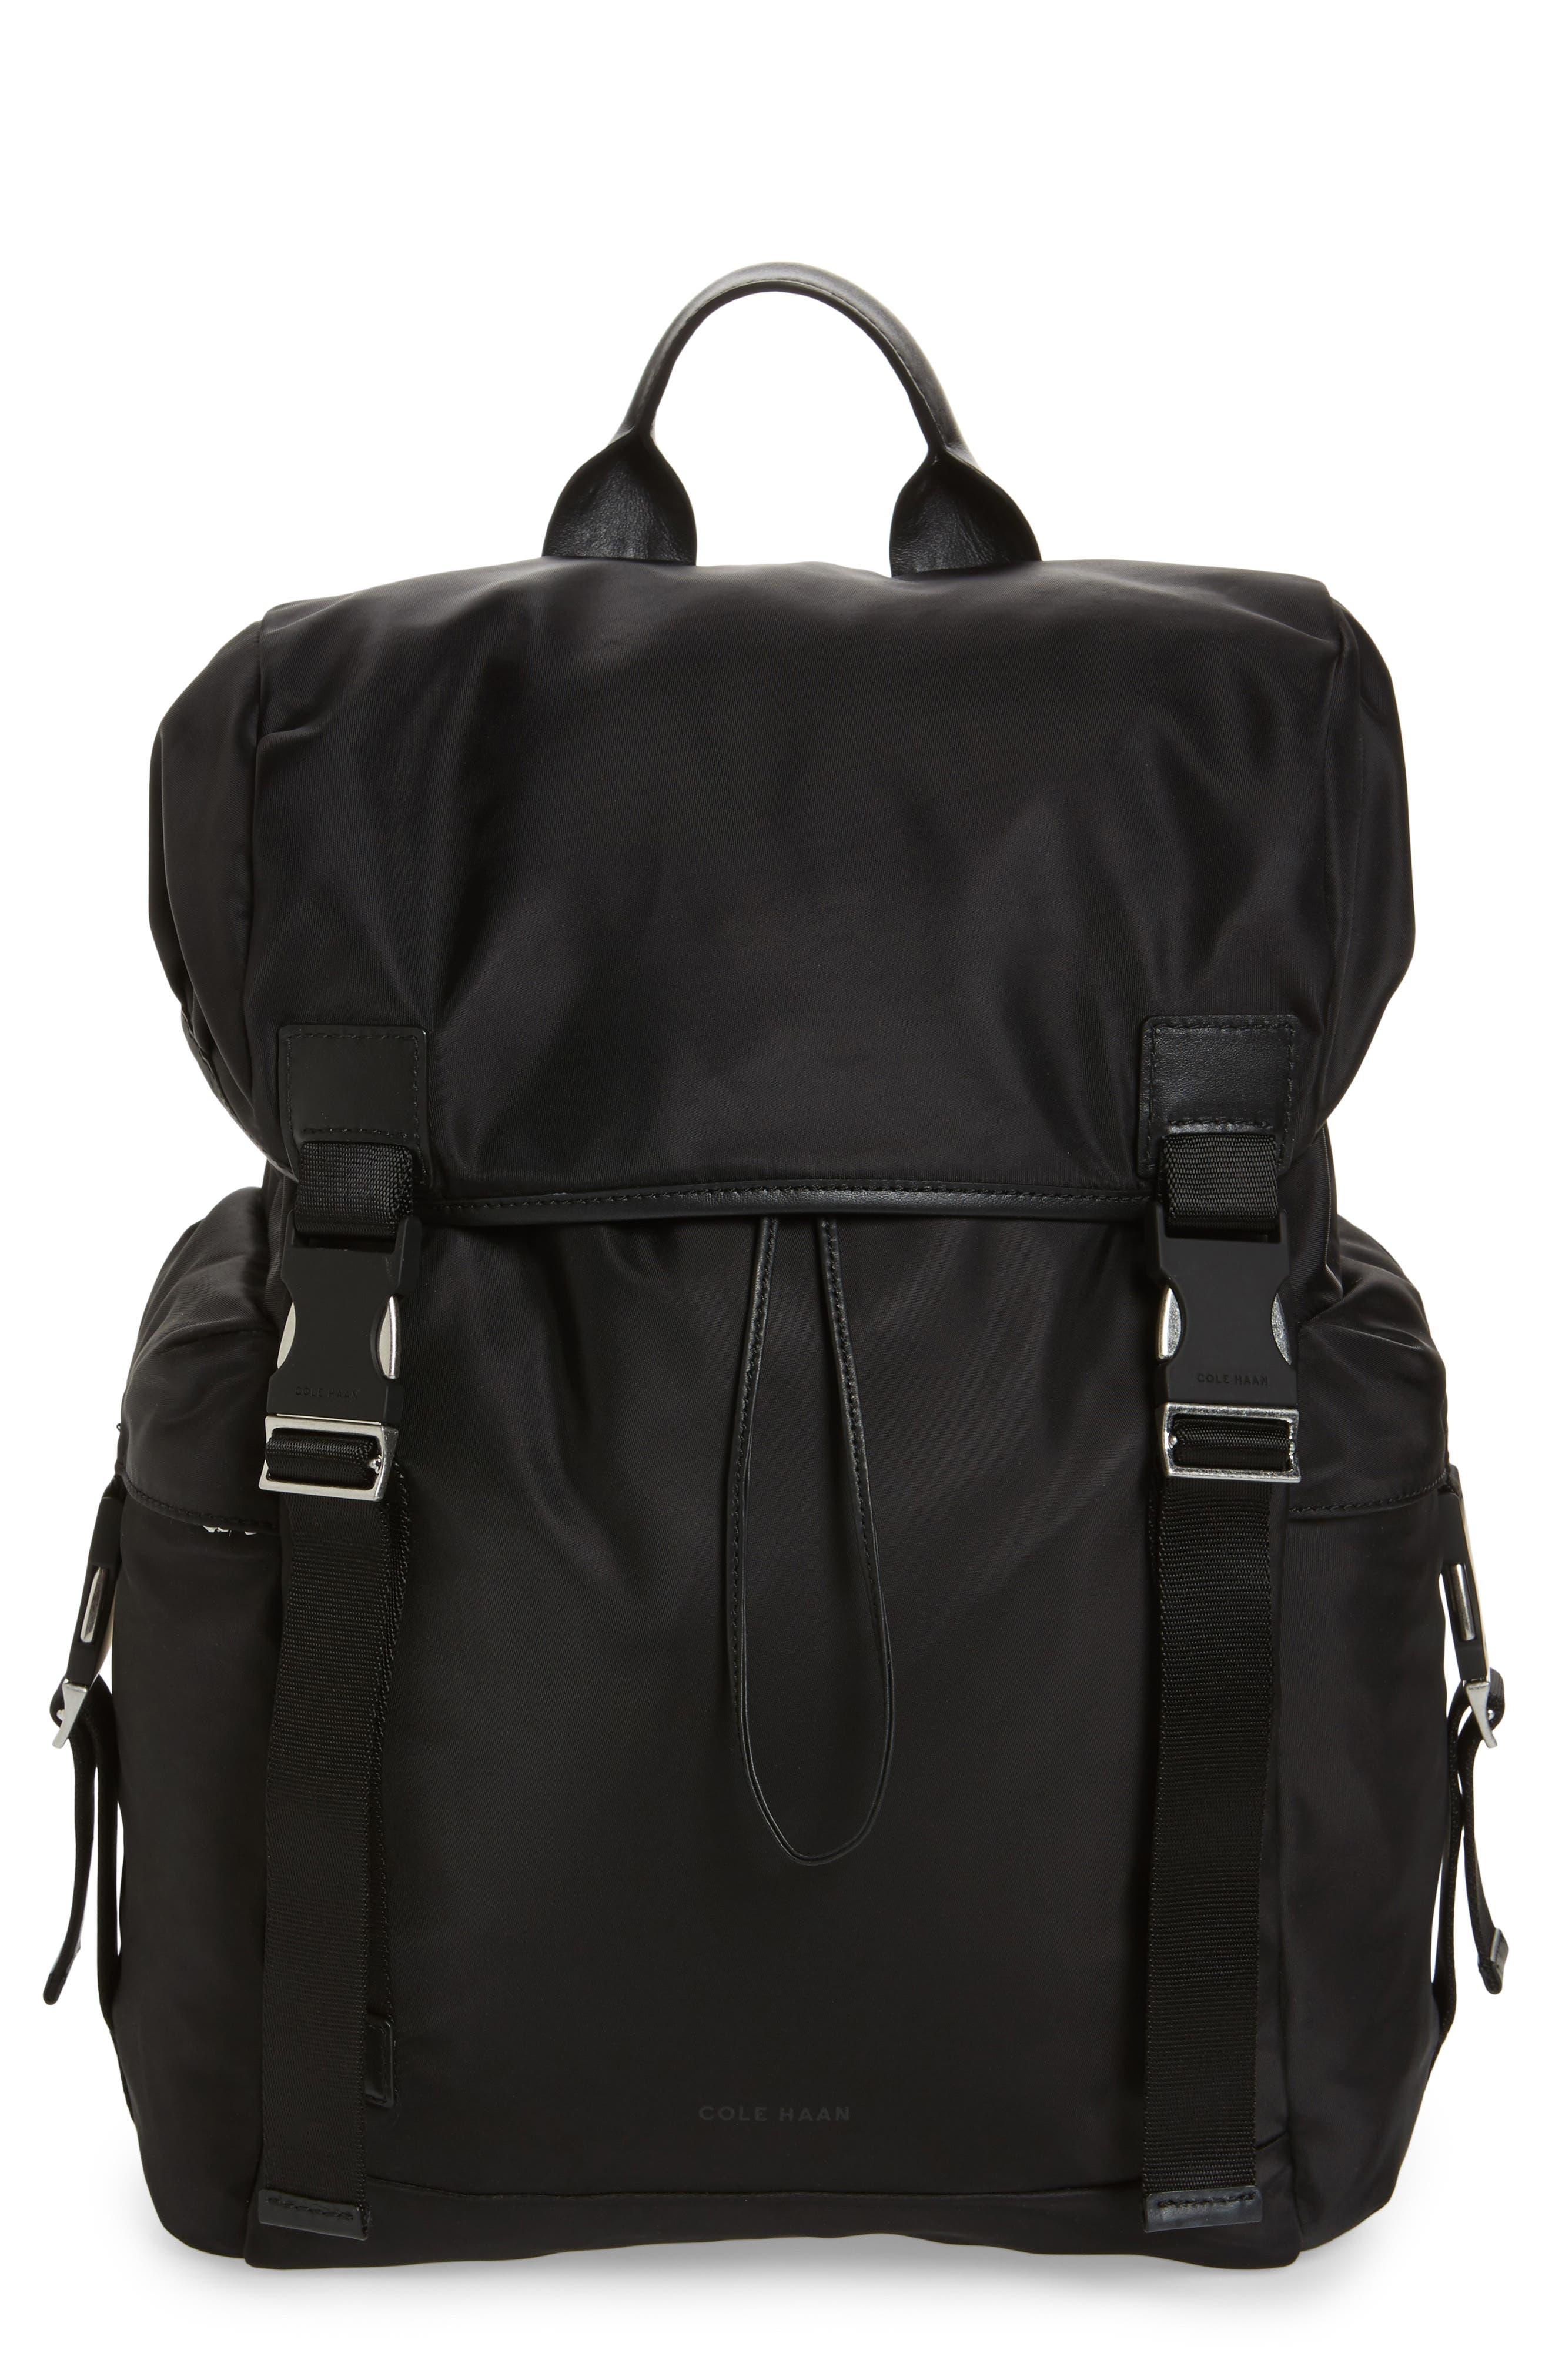 City Backpack,                             Main thumbnail 1, color,                             001